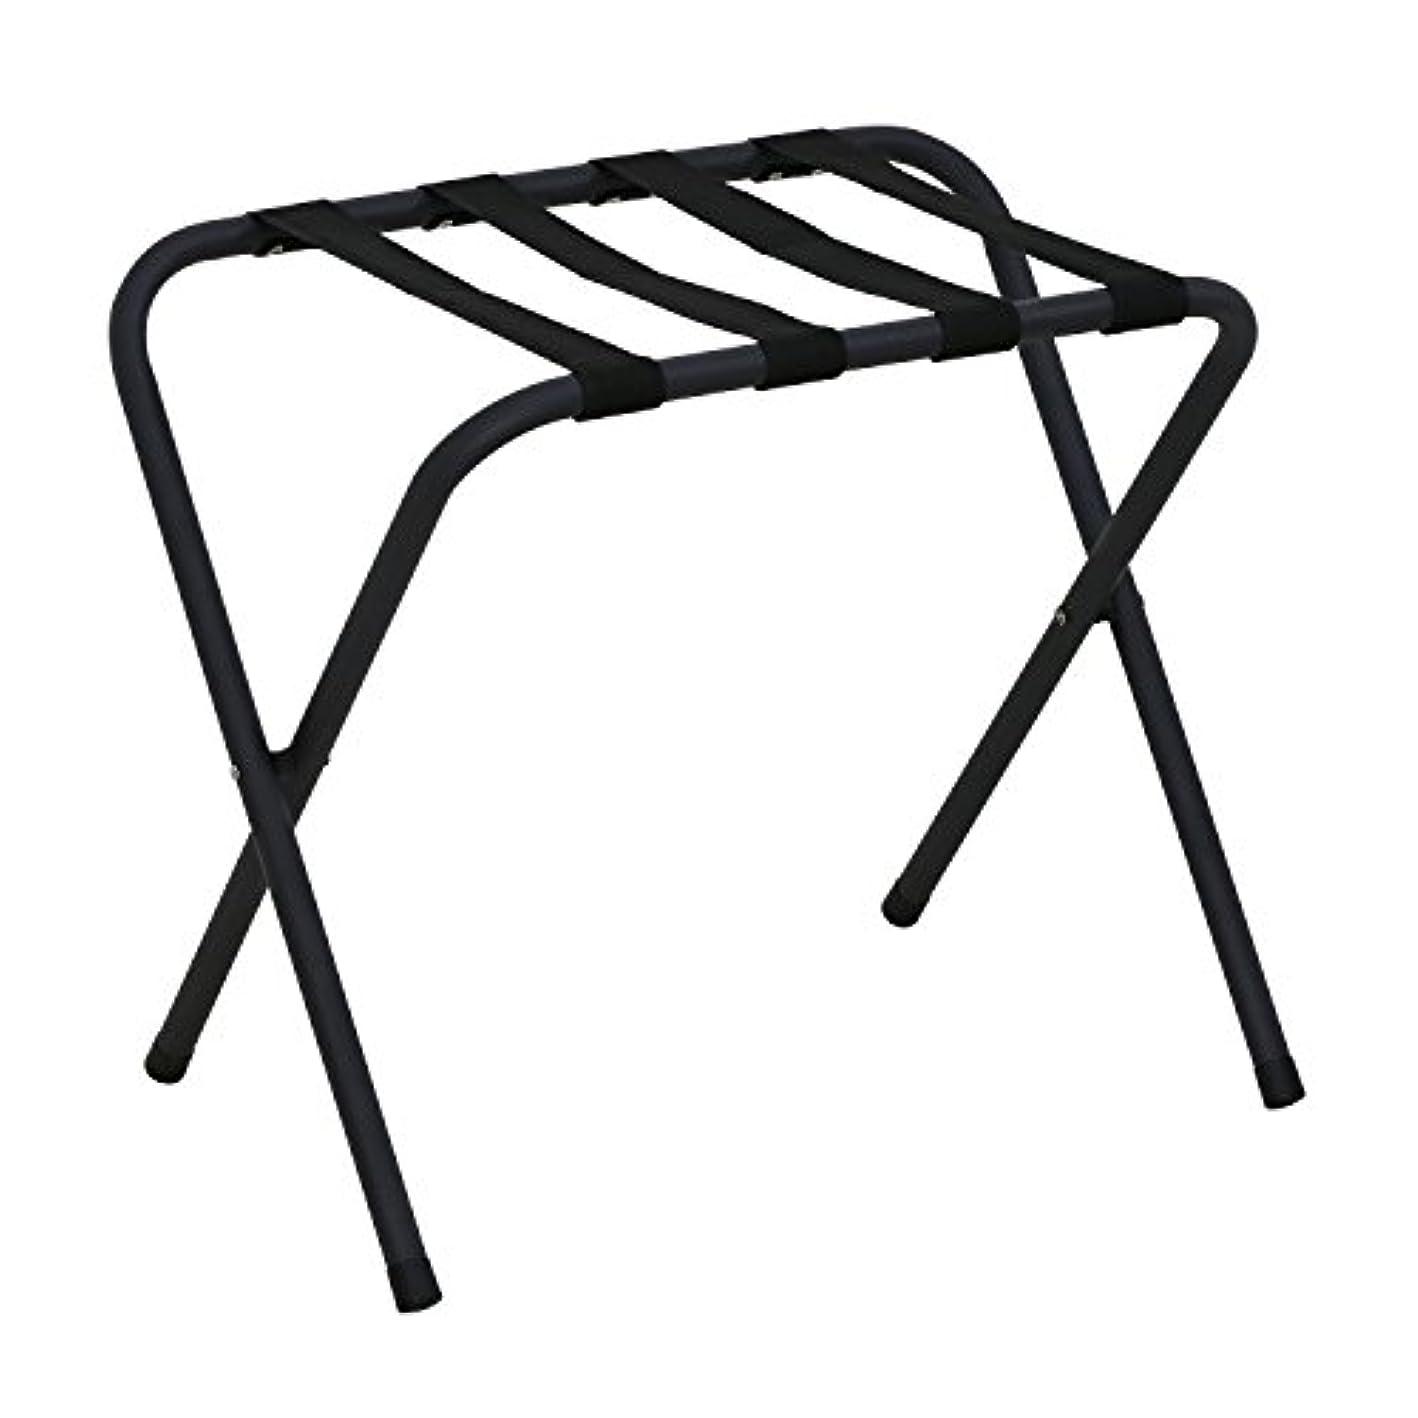 Furinno FLR1601 Foldable Luggage Rack, Black